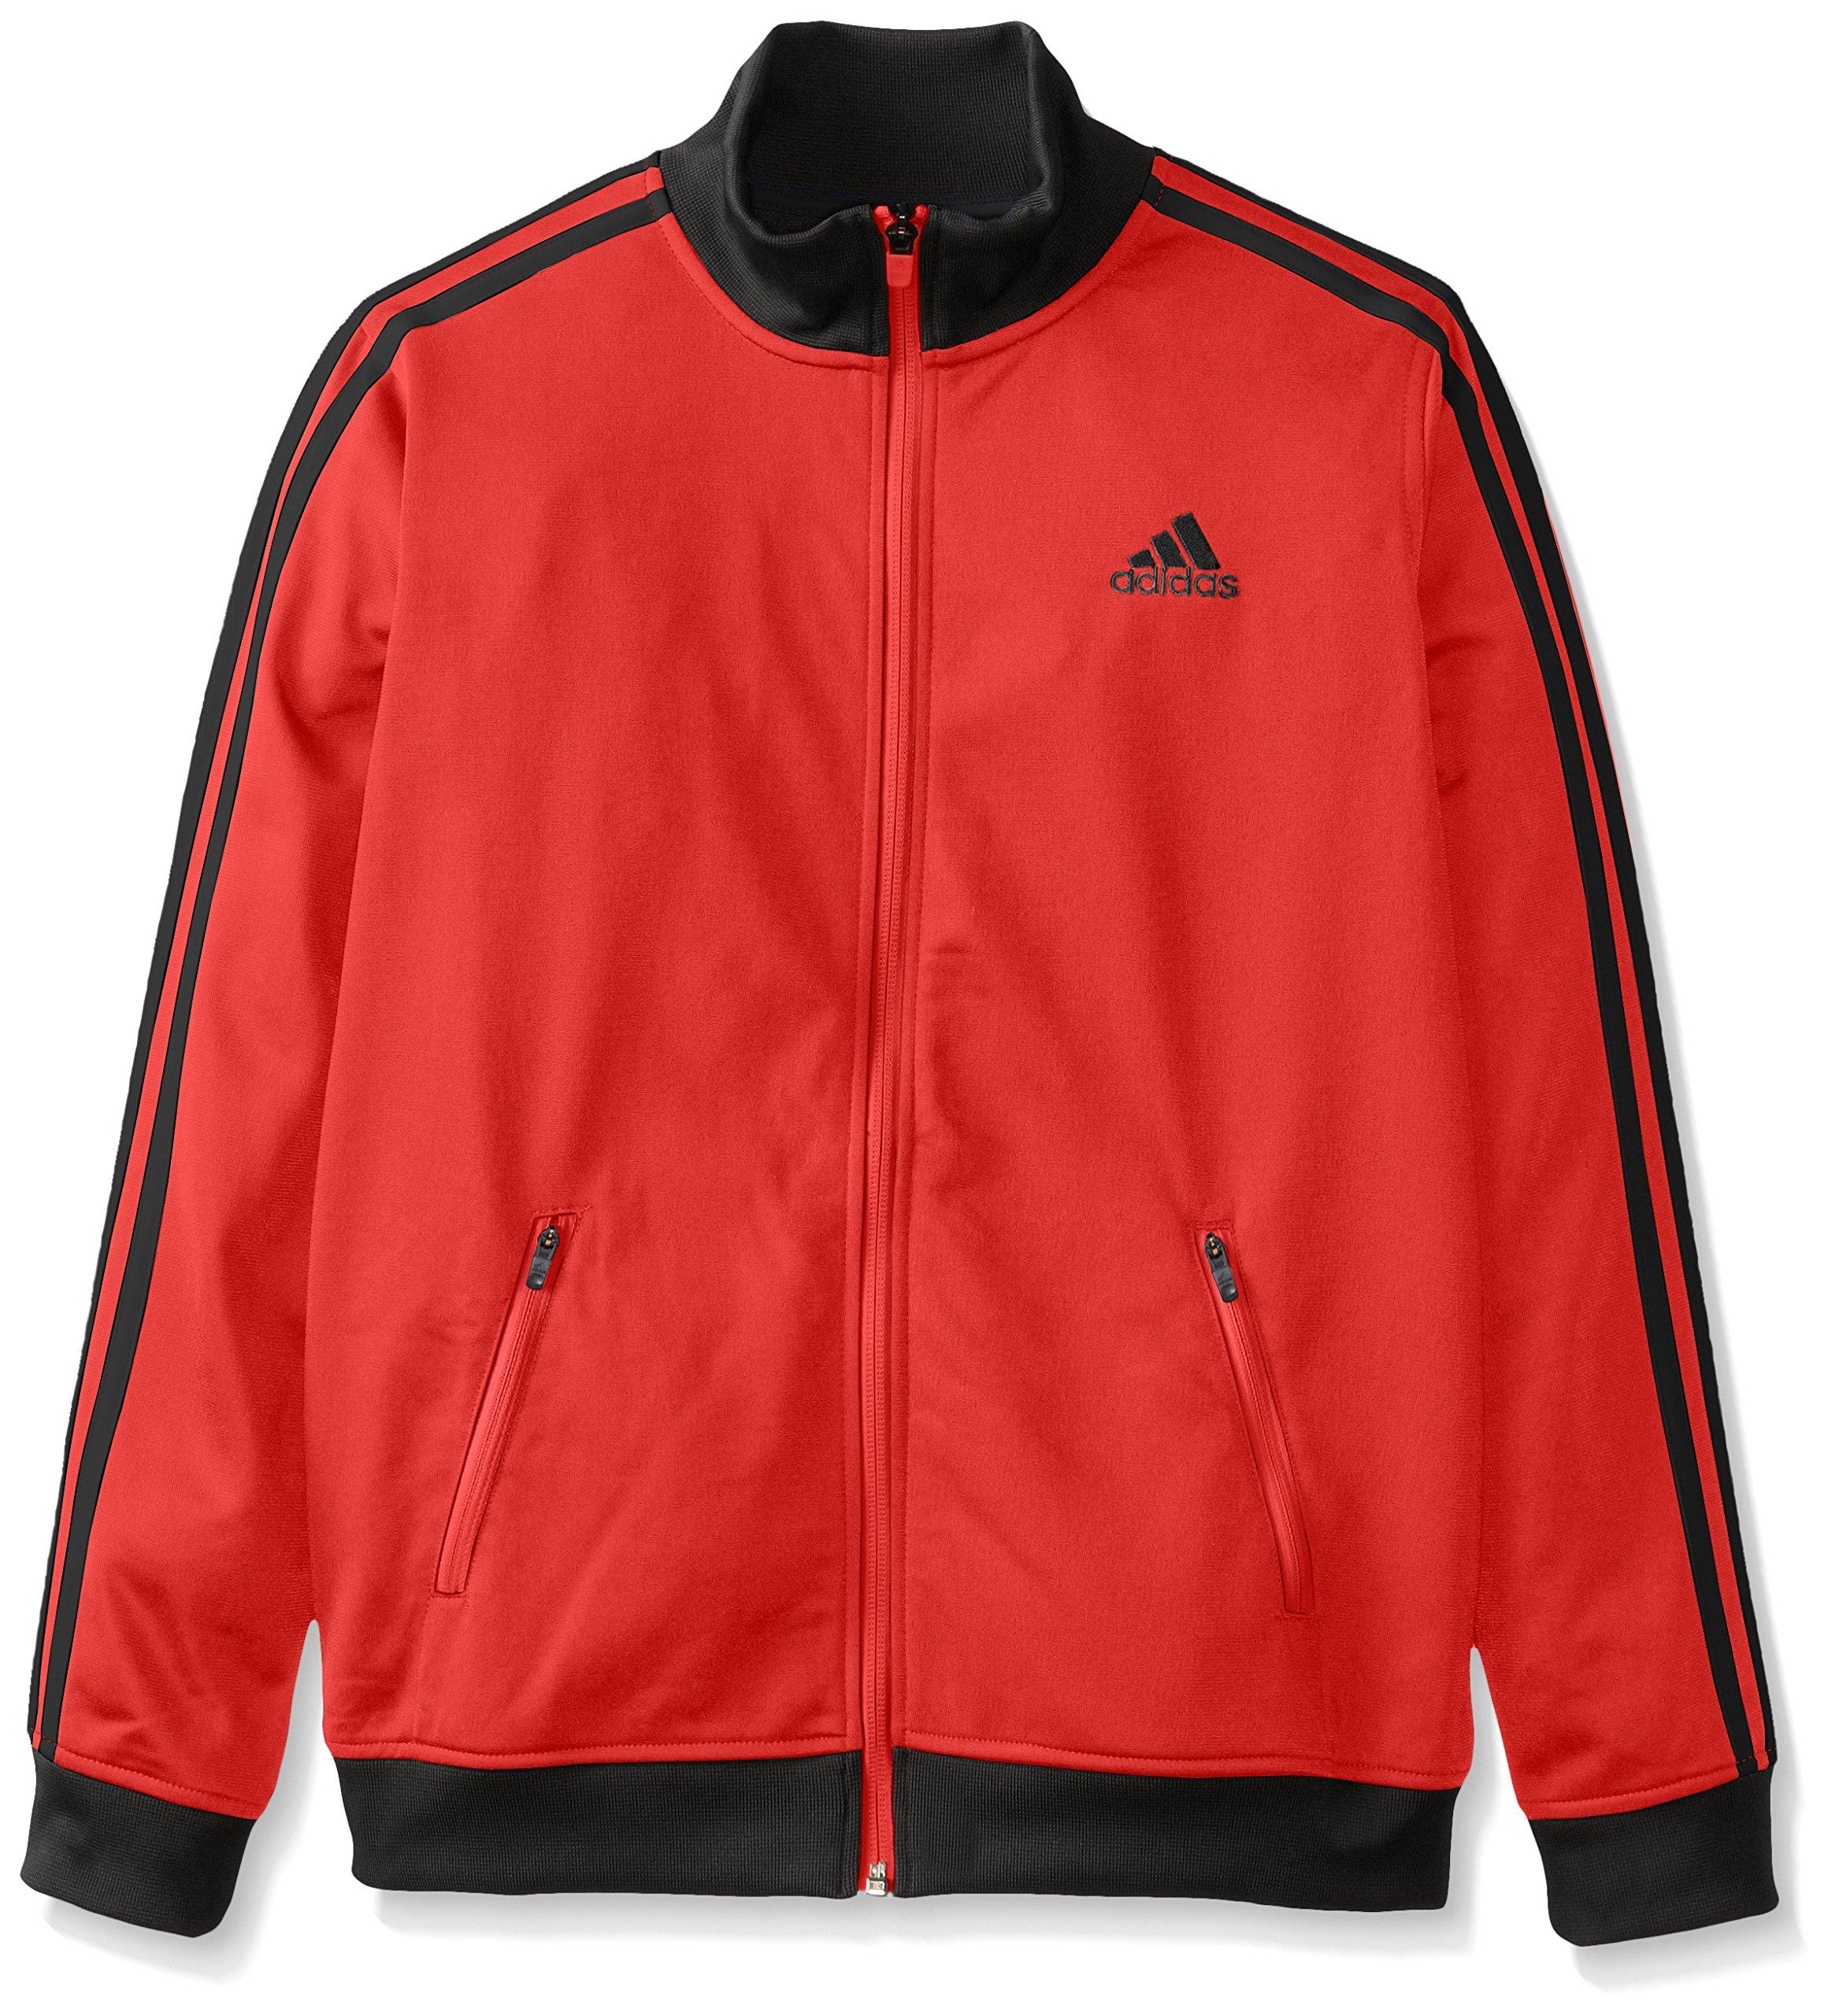 adidas Big Boys' Separates Training Track Jacket, Light Scarlet/Black, Small/8